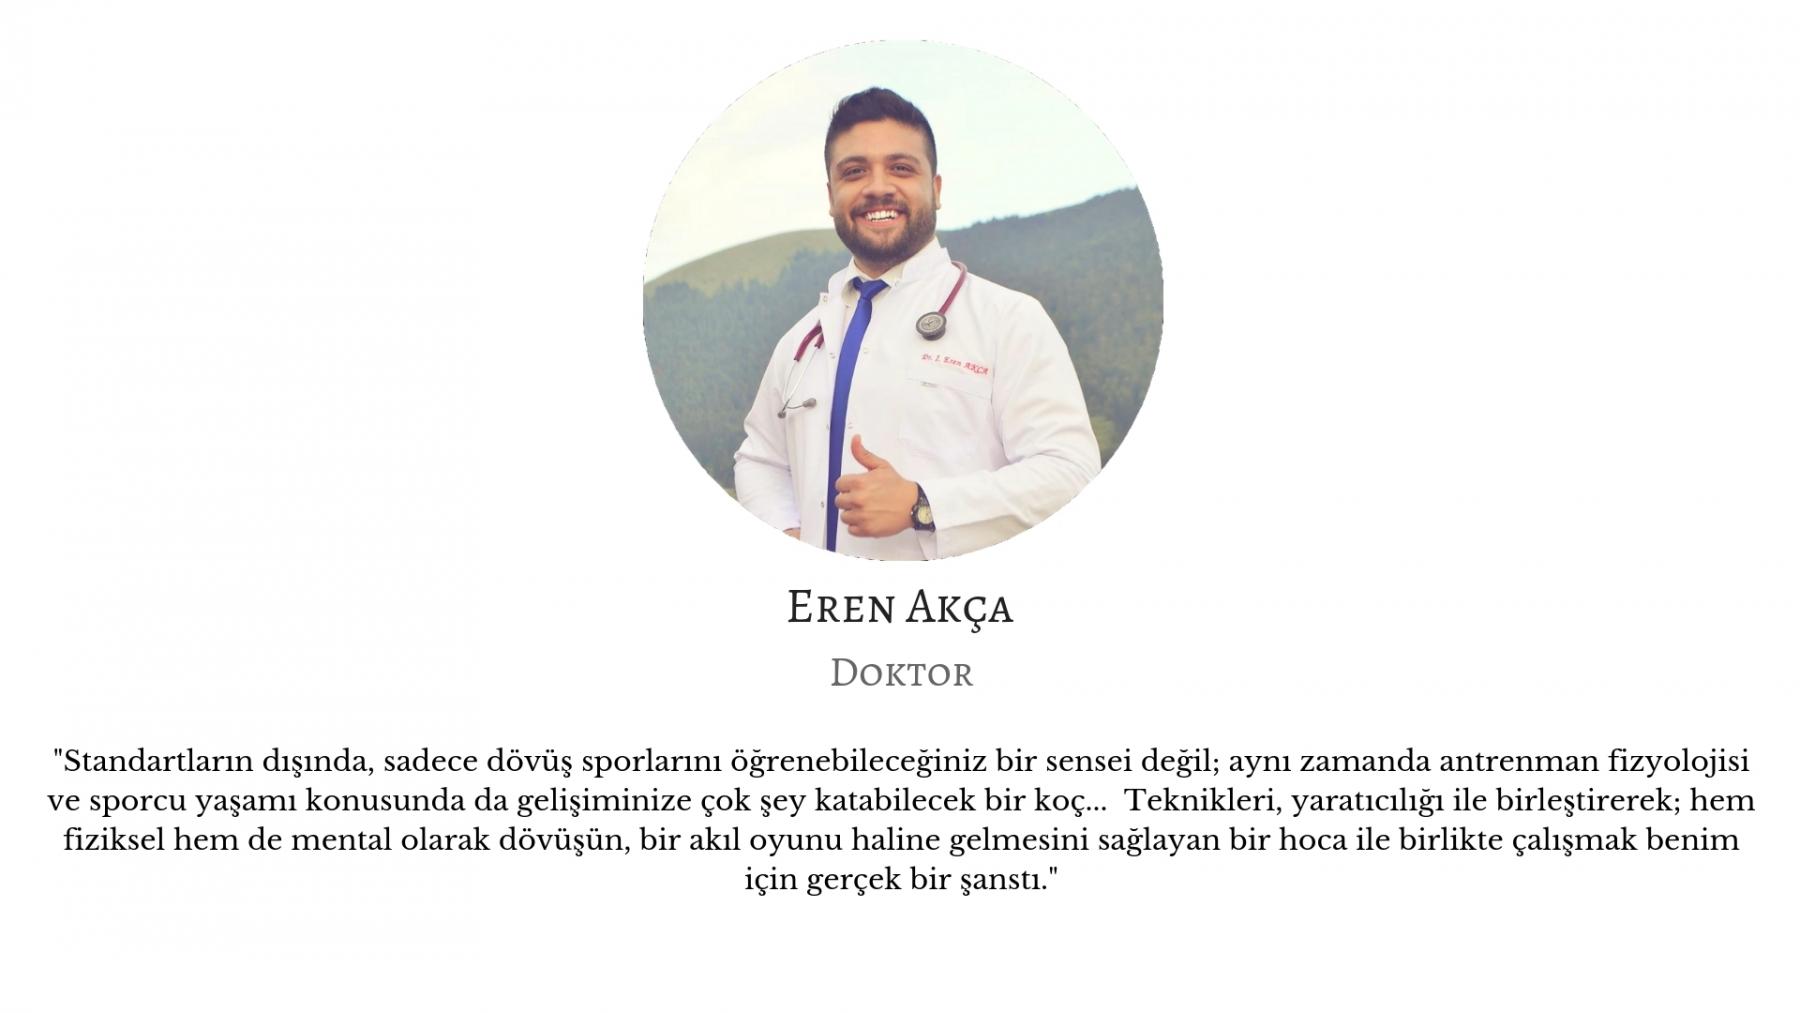 Eren Akça - Doktor yasin ozkan mma bjj izmir jiujitsu muay thai fitness pt